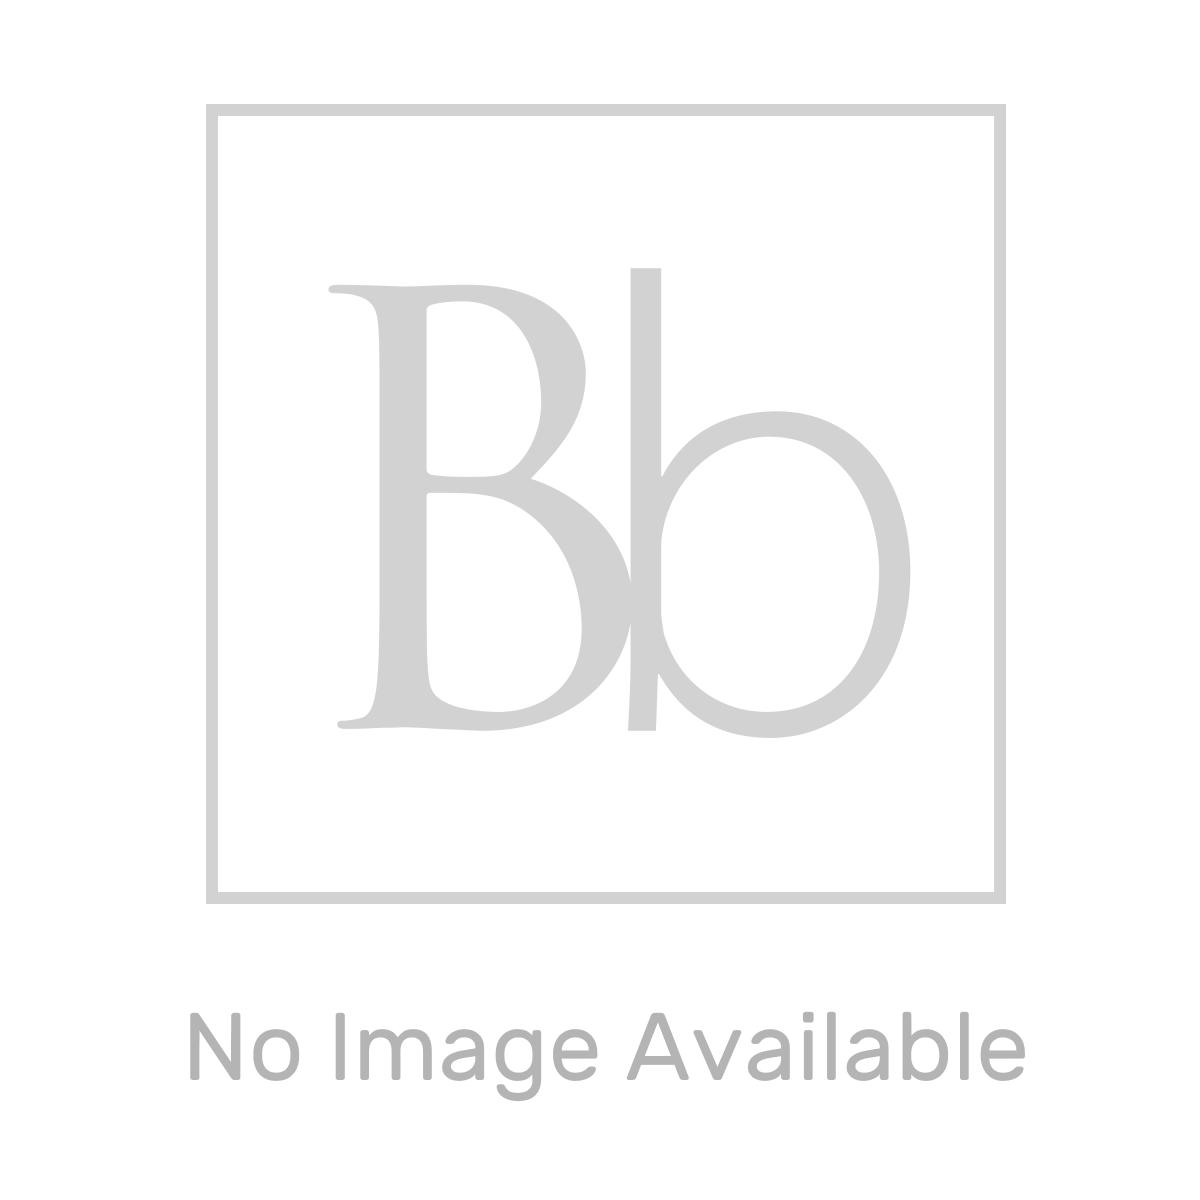 RAK Compact 1 Tap Hole Wall Hung Basin Dimensions